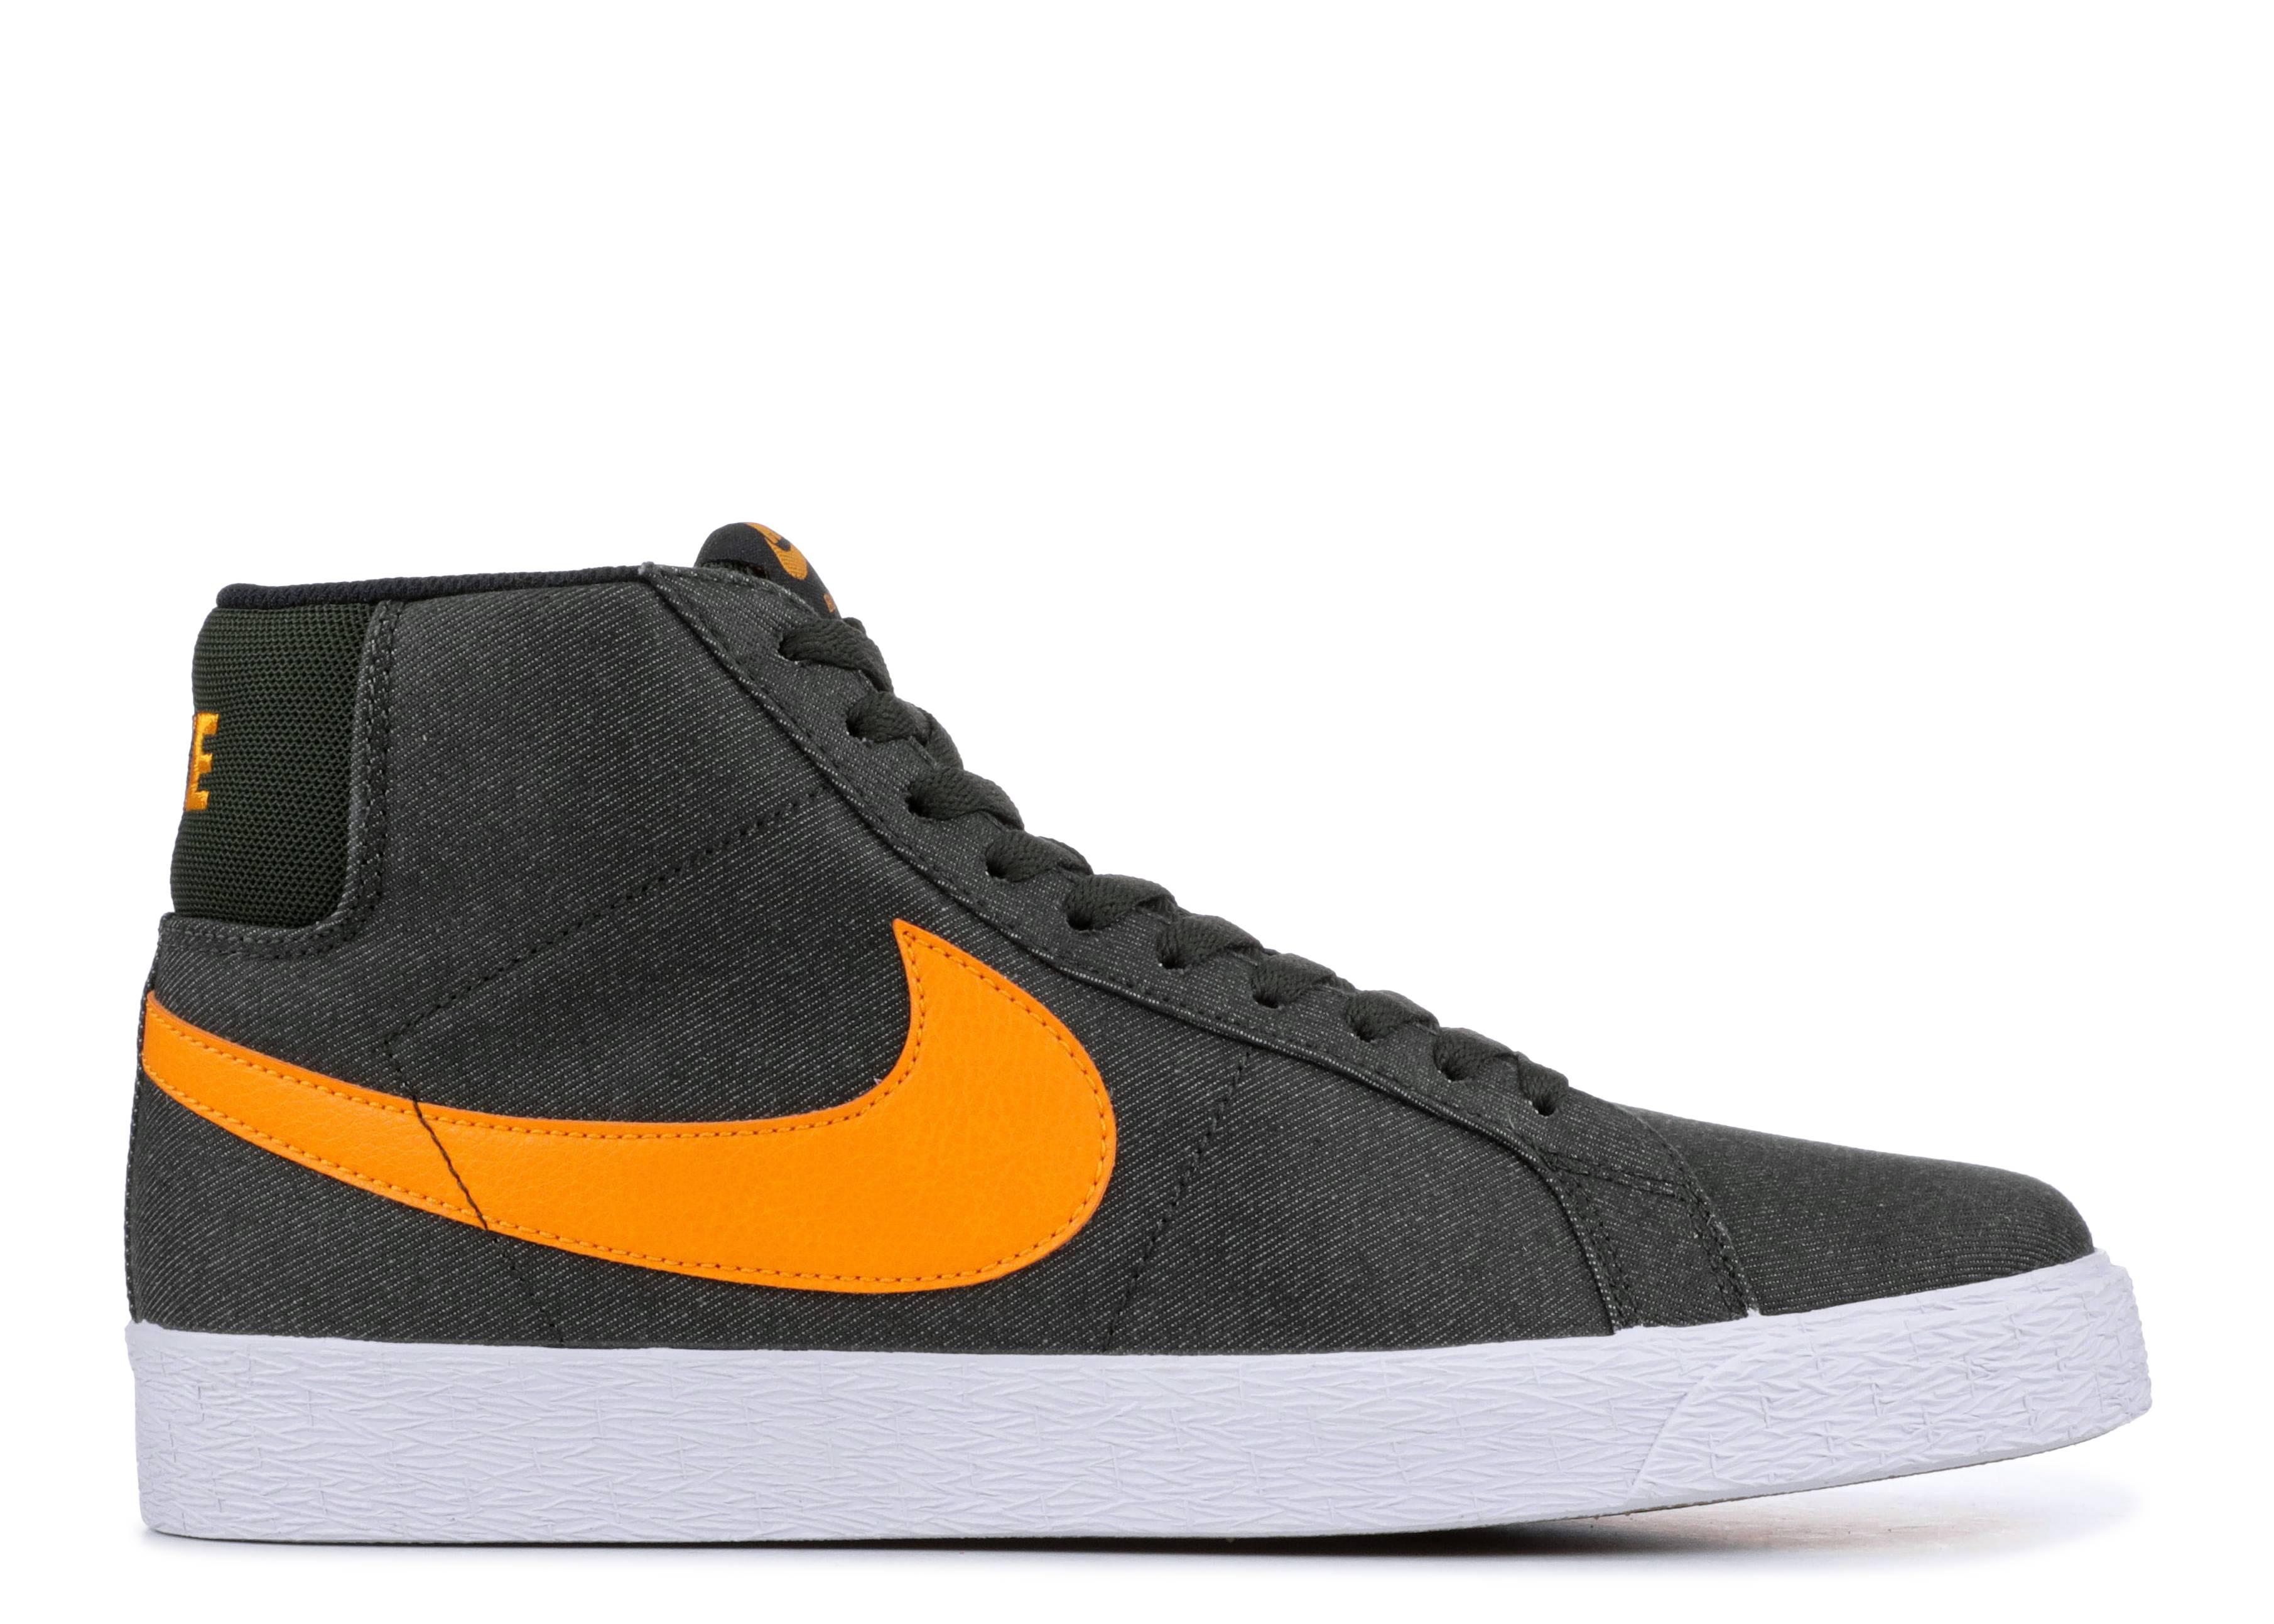 68759421a282 Nike Sb Zoom Blazer Mid - Nike - 864349 308 - sequoia black-circuit ...